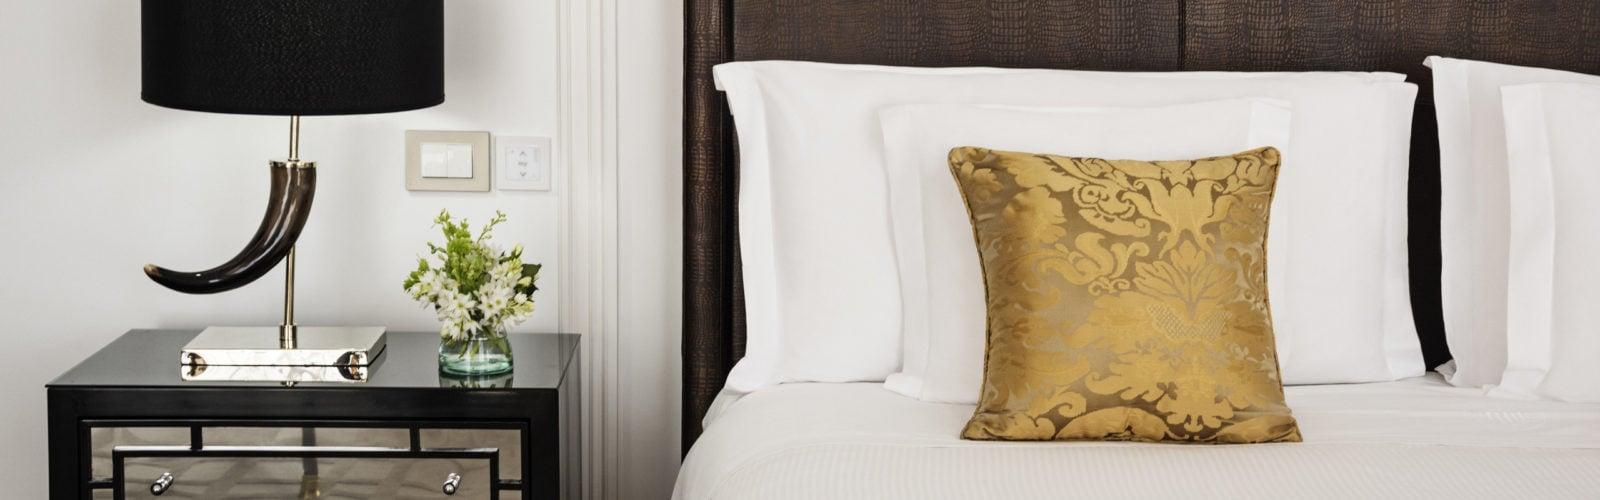 alvear-palace-hotel-bedroom